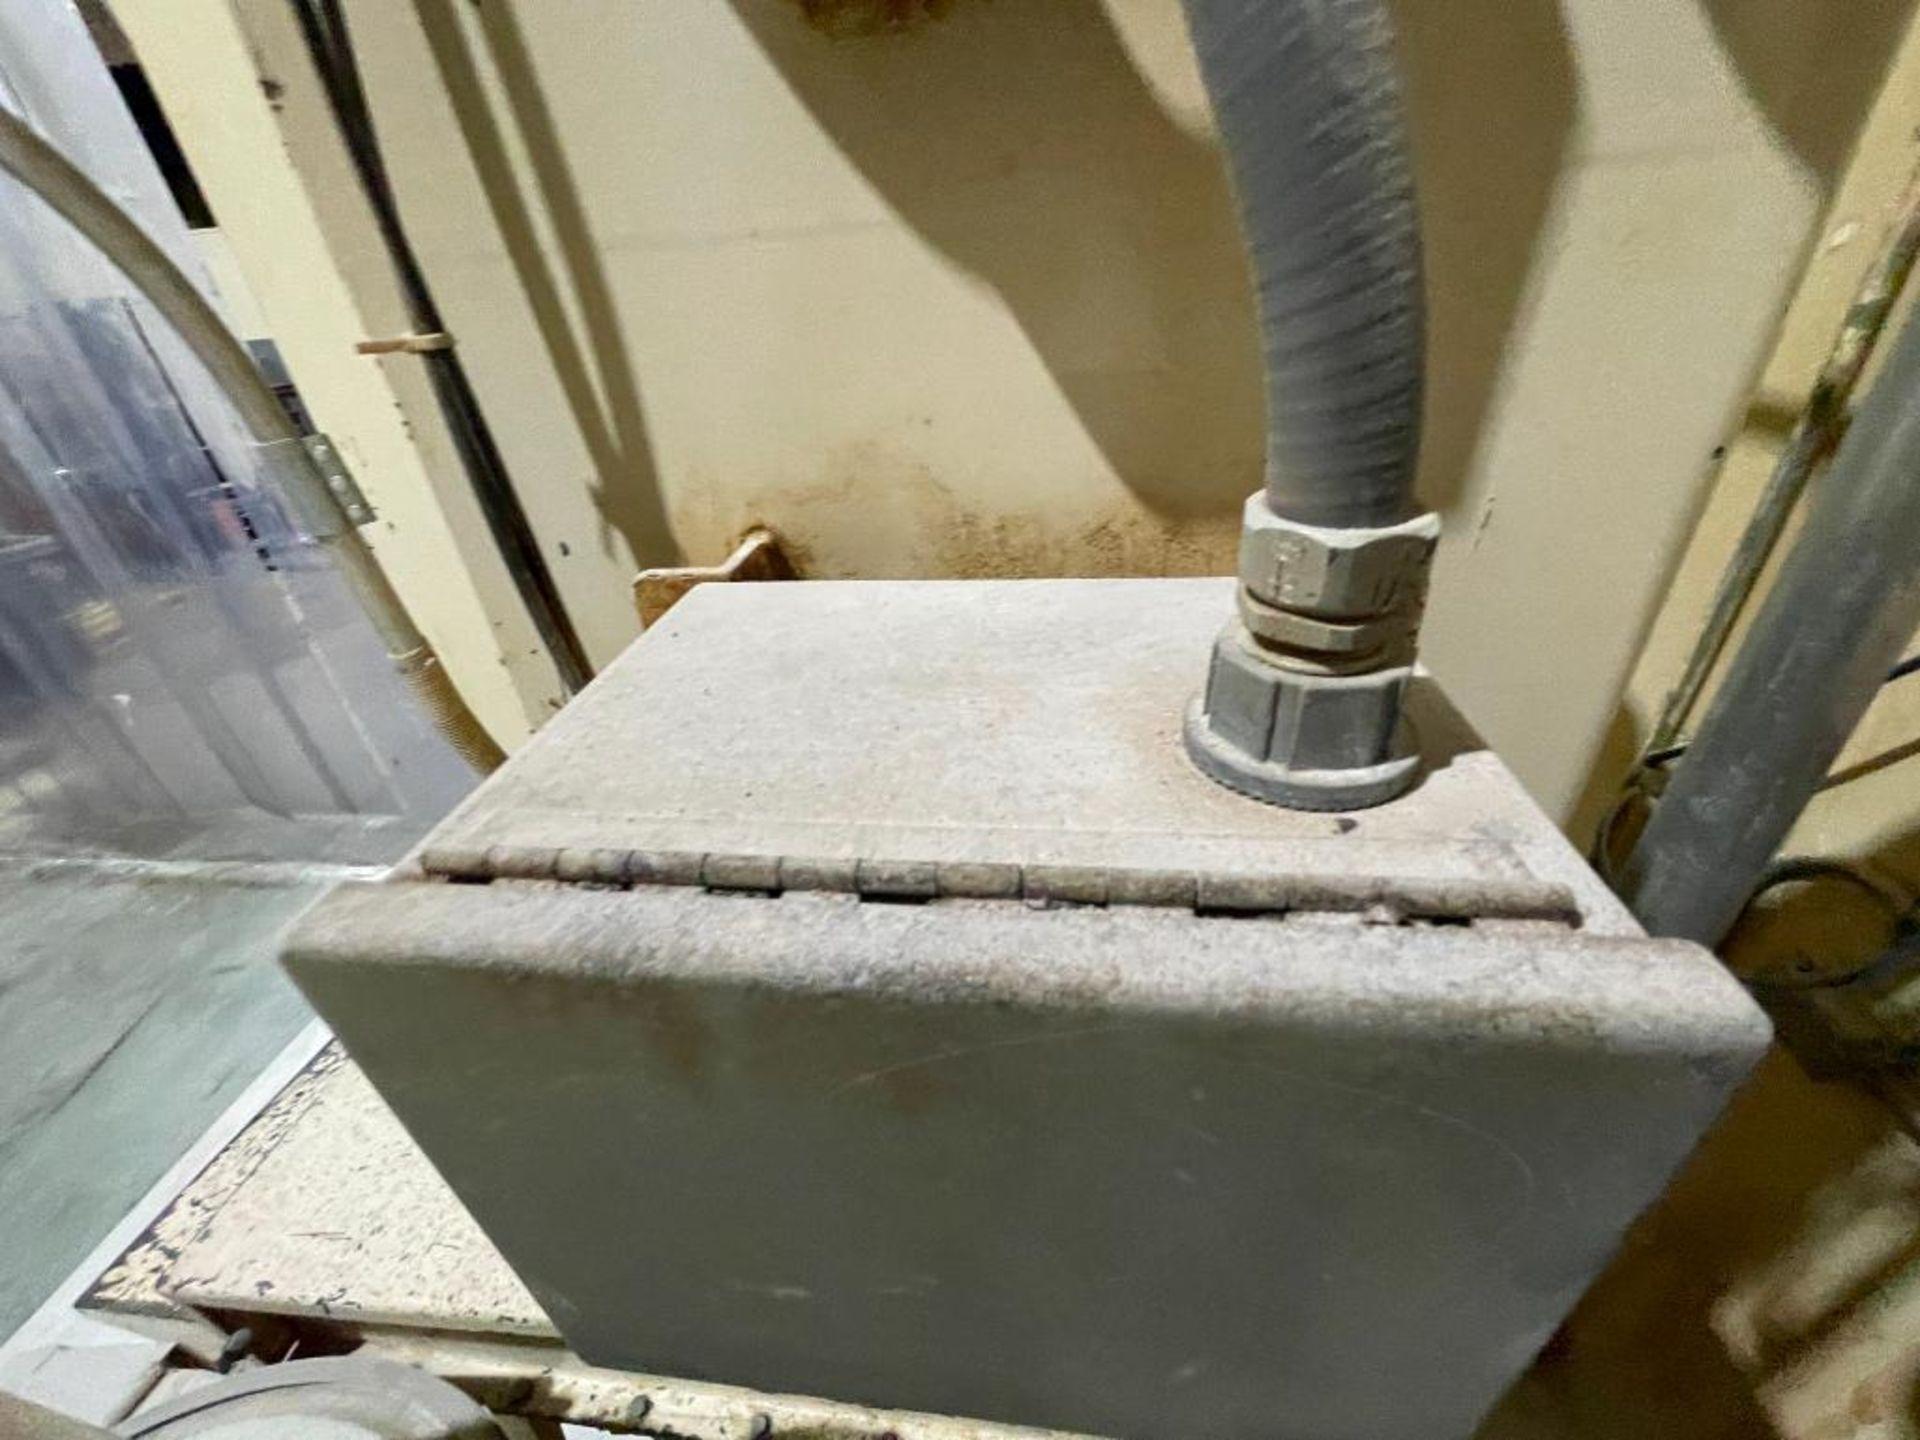 MAC dry ingredients dump station - Image 13 of 24